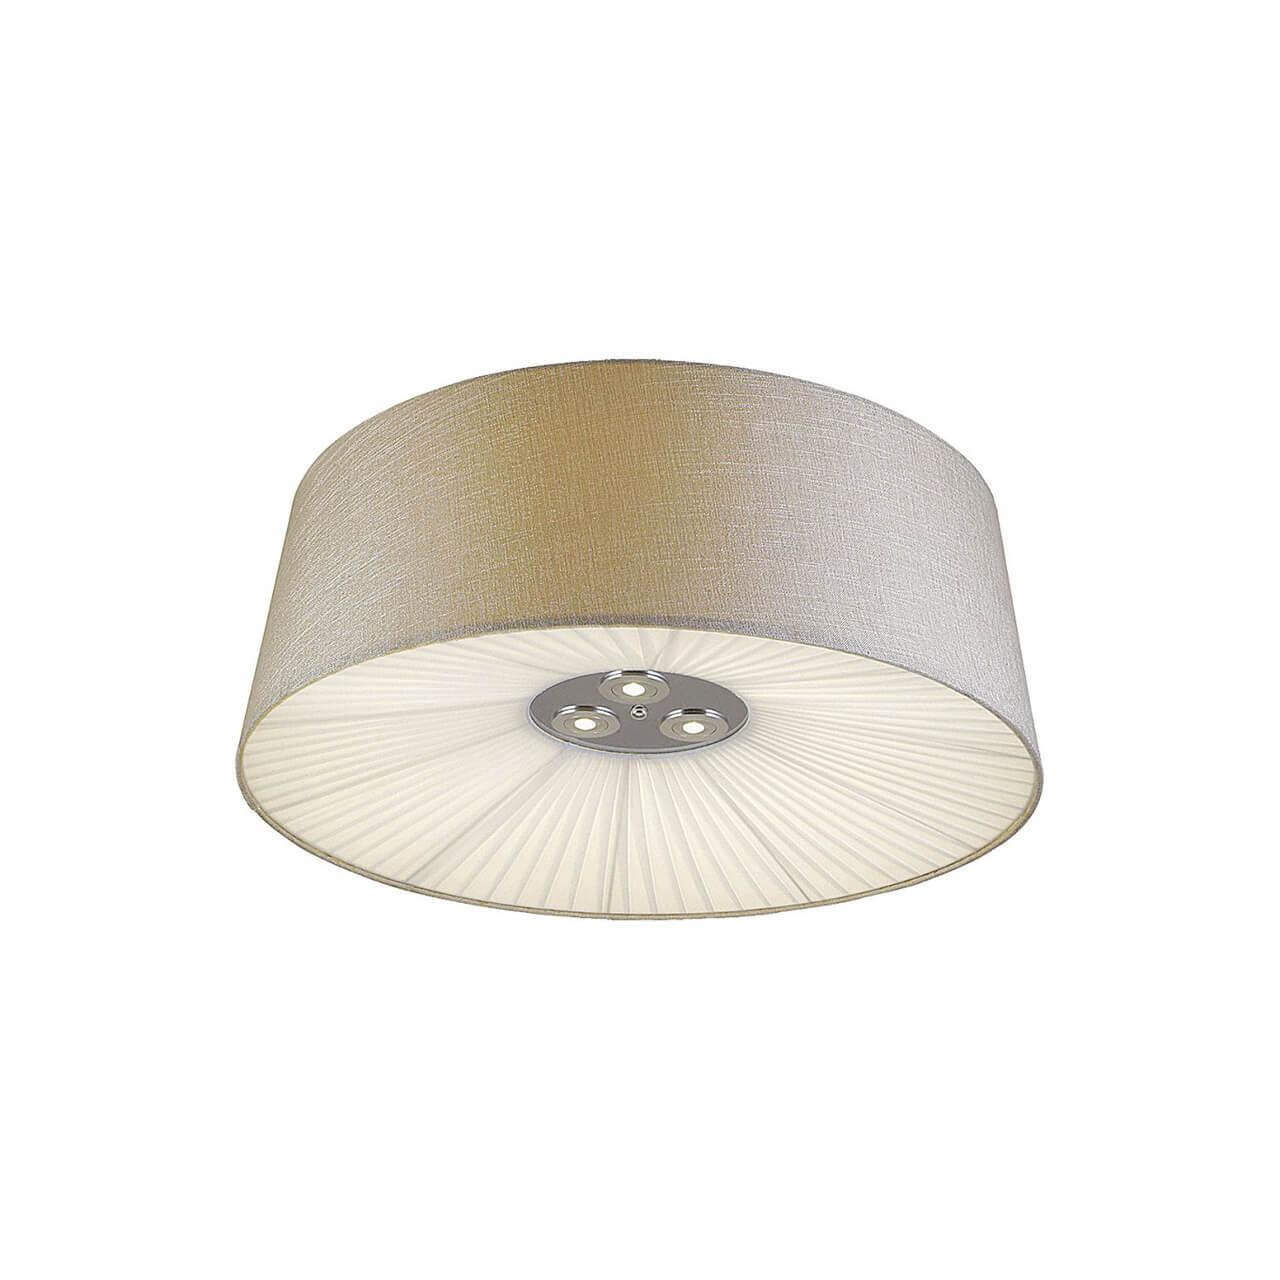 Светильник Favourite 1056-8C Cupola светильник natali kovaltseva 10714 8c toon